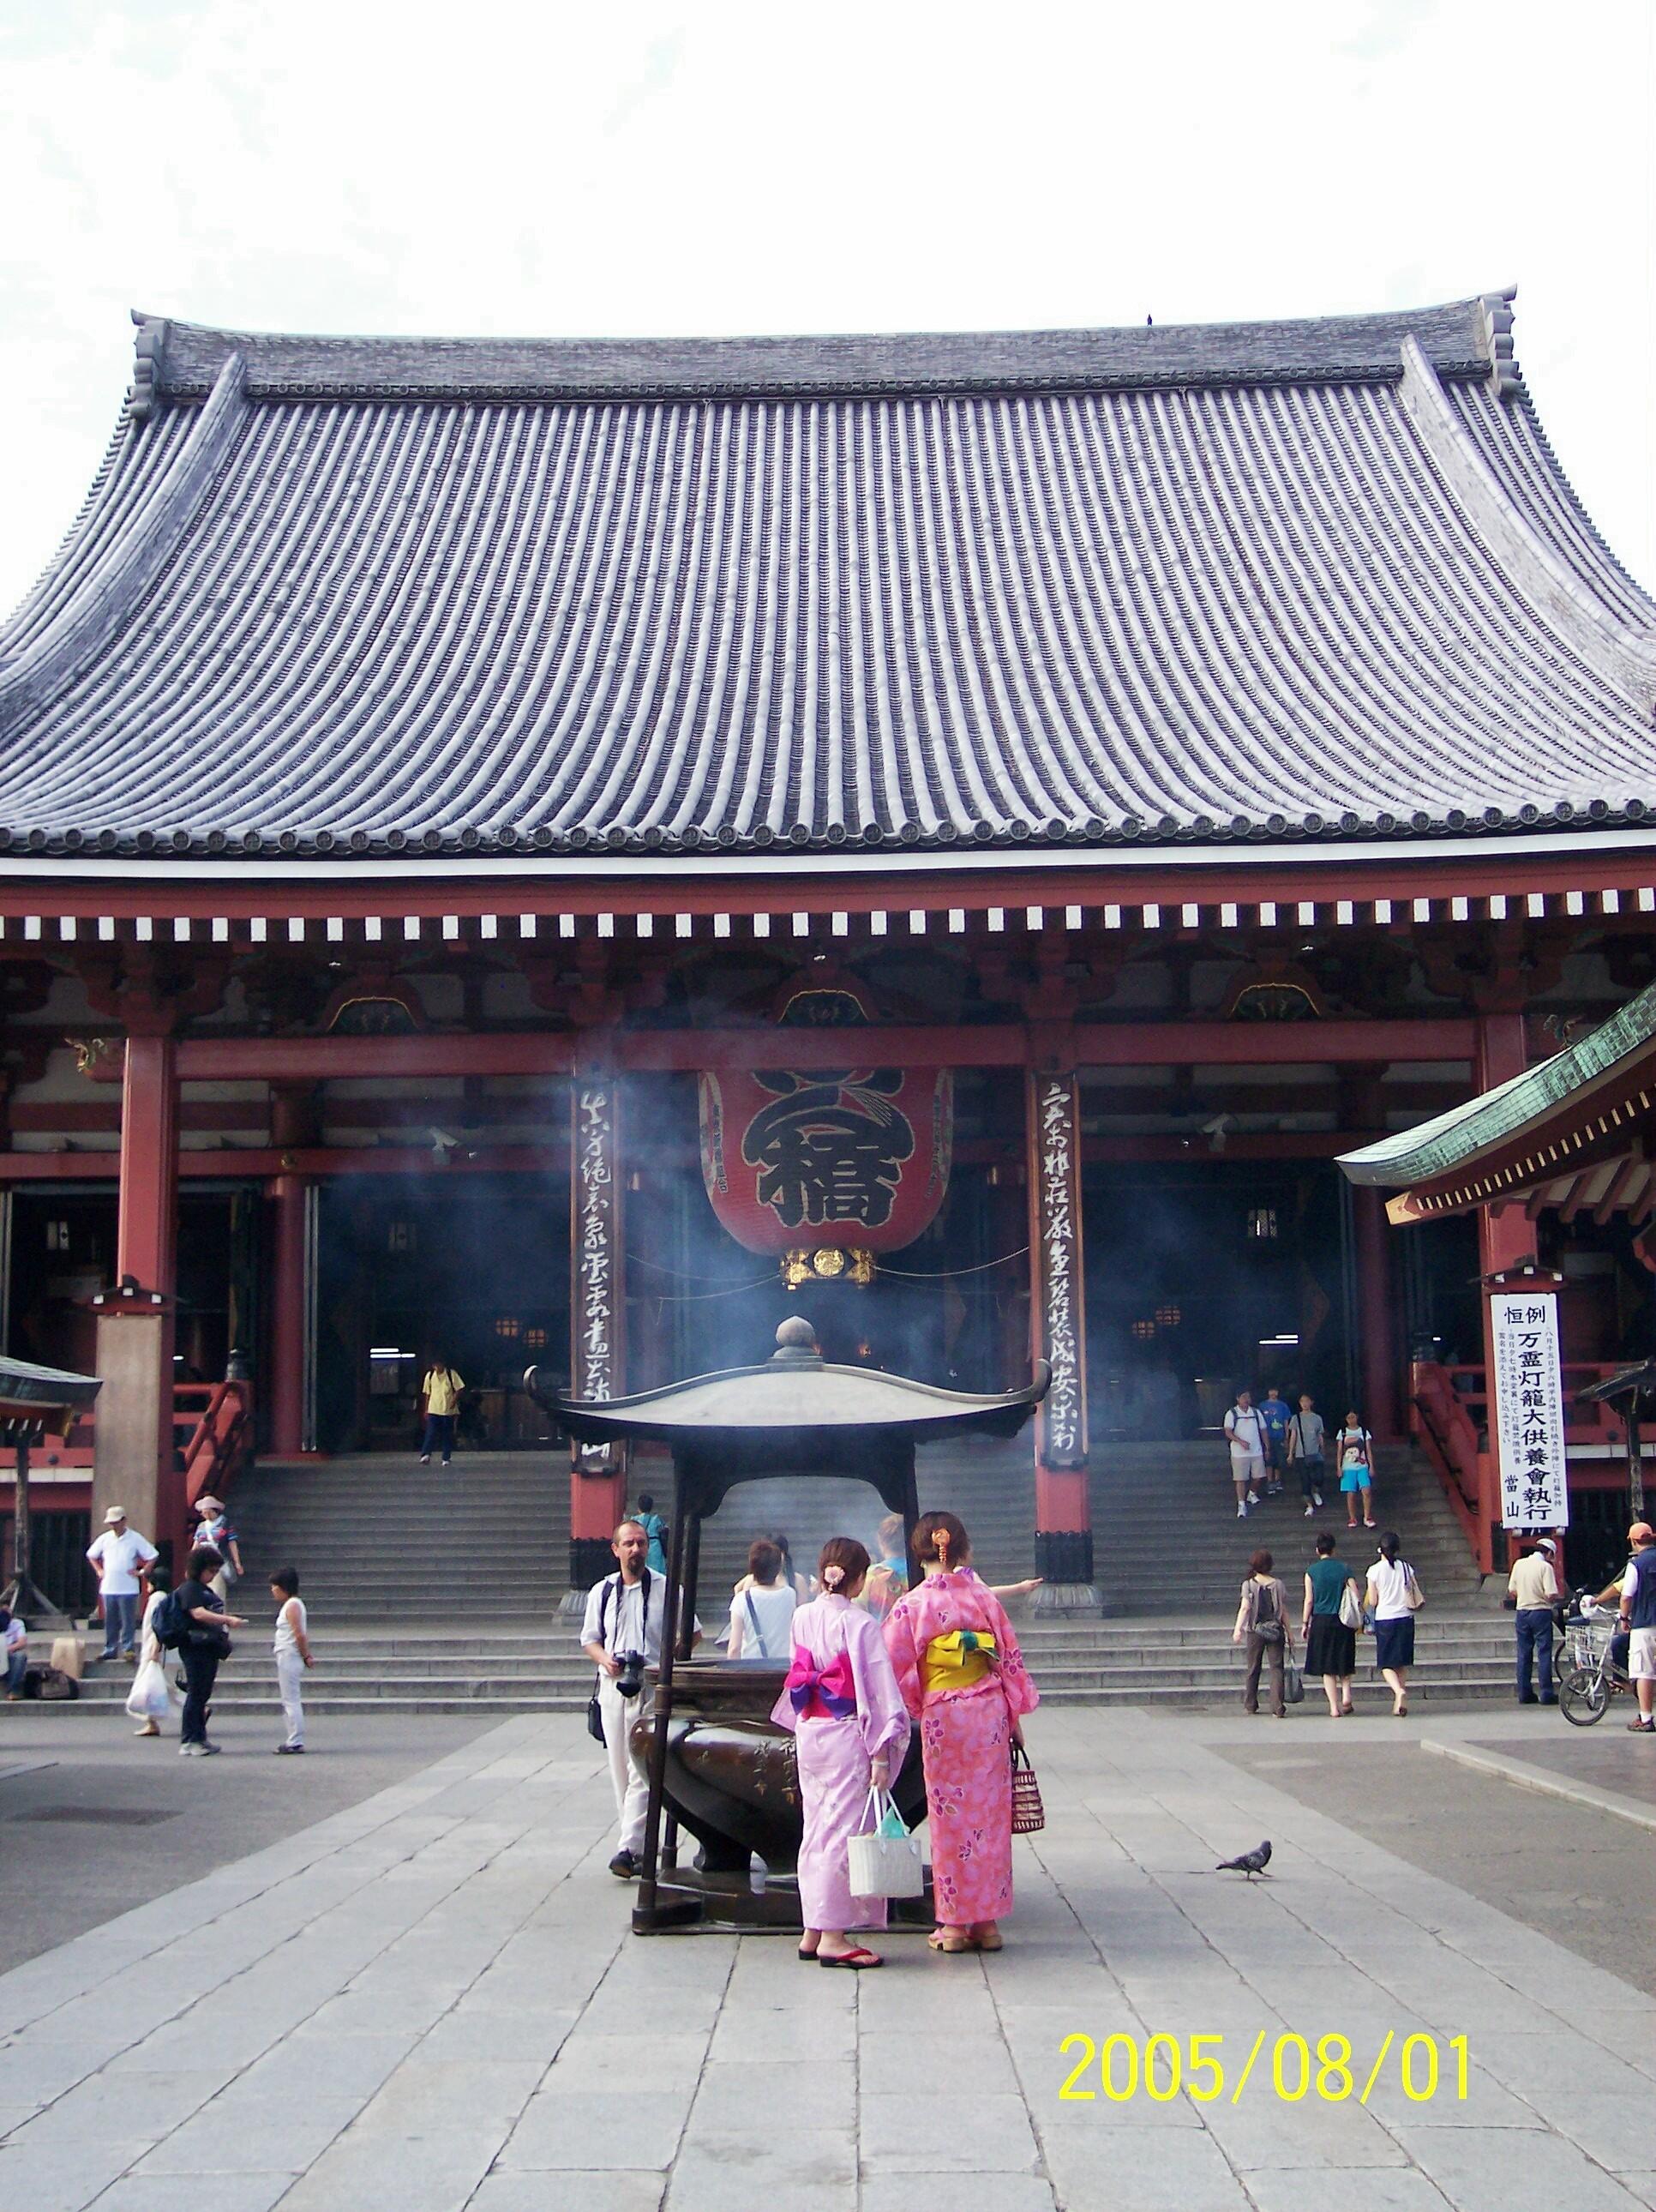 Asakusa Kannon temple entrance, Tokyo (Scarborough photo)